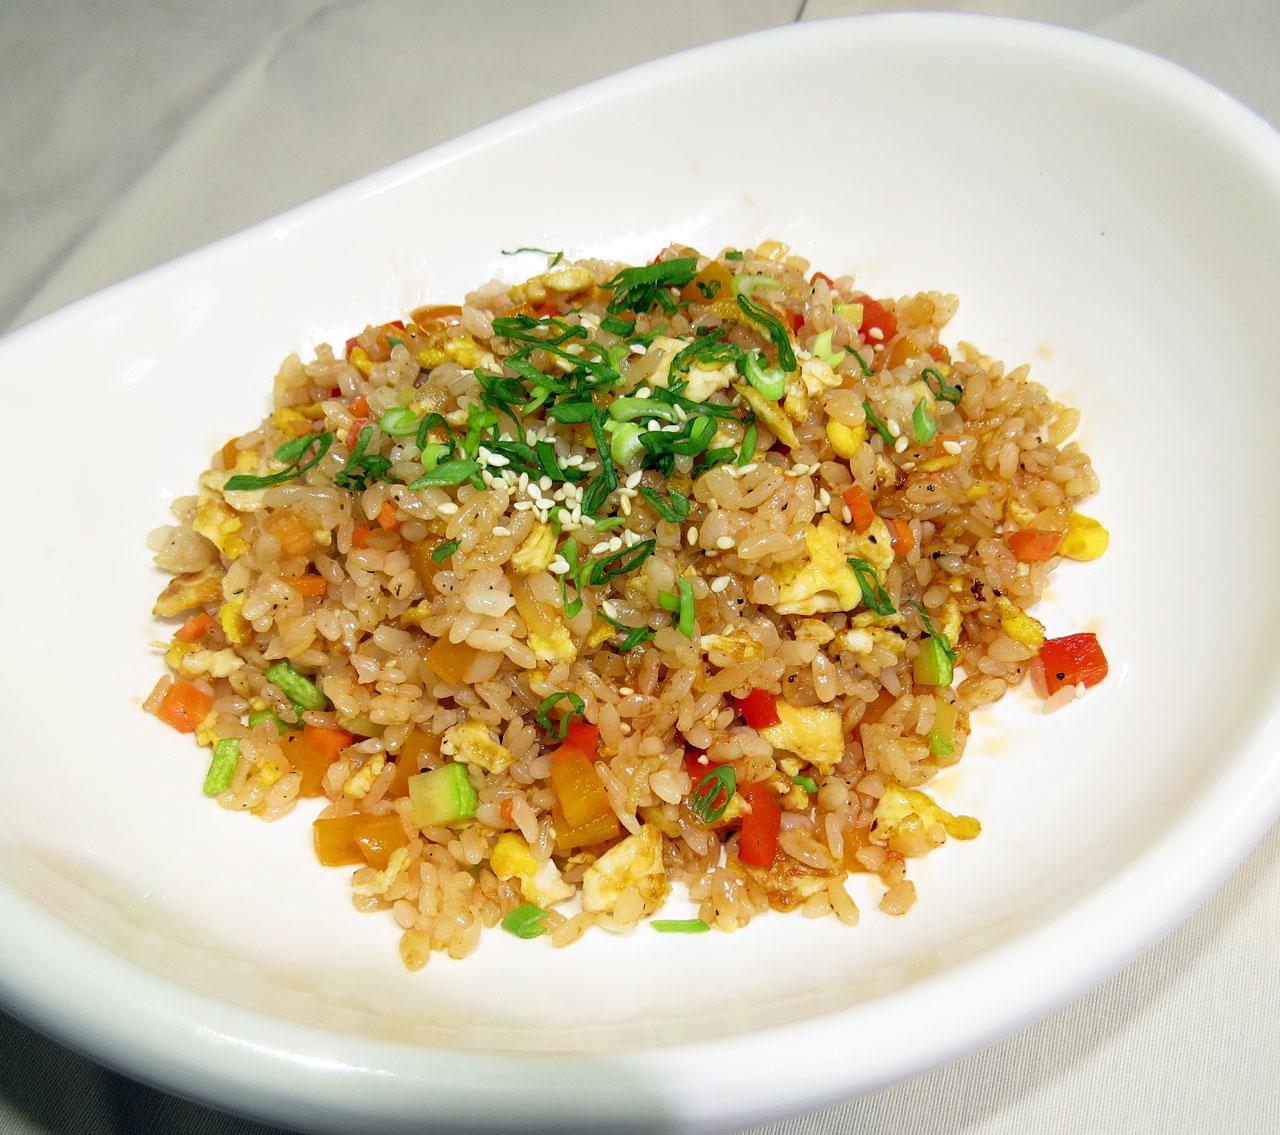 Чахан Жаренный рис с овощами. Ресторан Аннам Брахма в Оренбурге